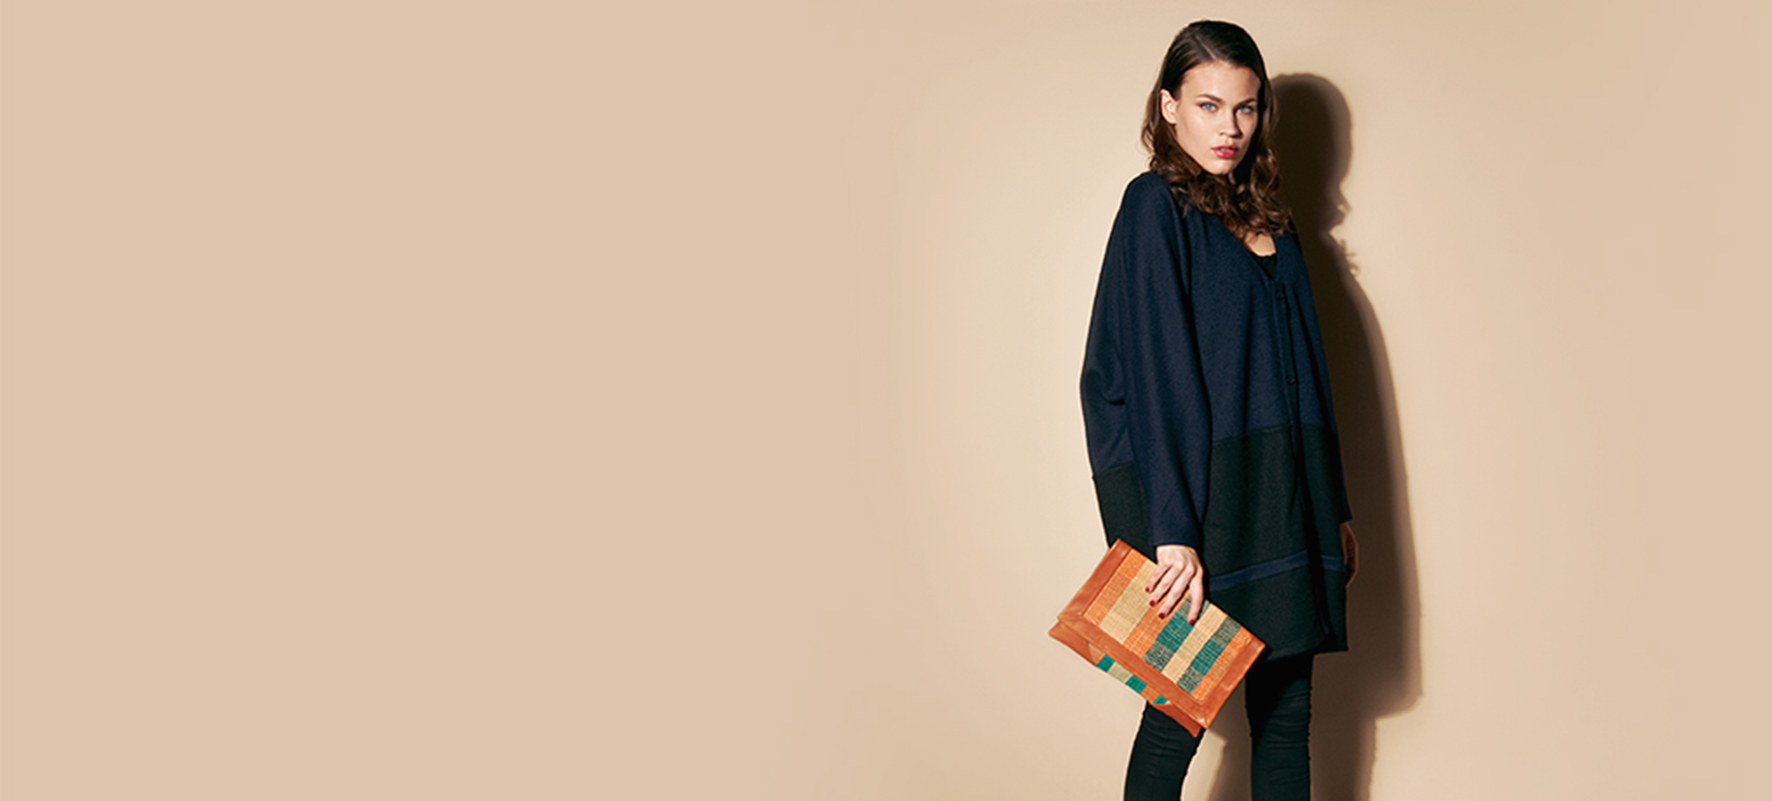 wool-coat-woman-bicolored-leather-raphia-clutch.jpg